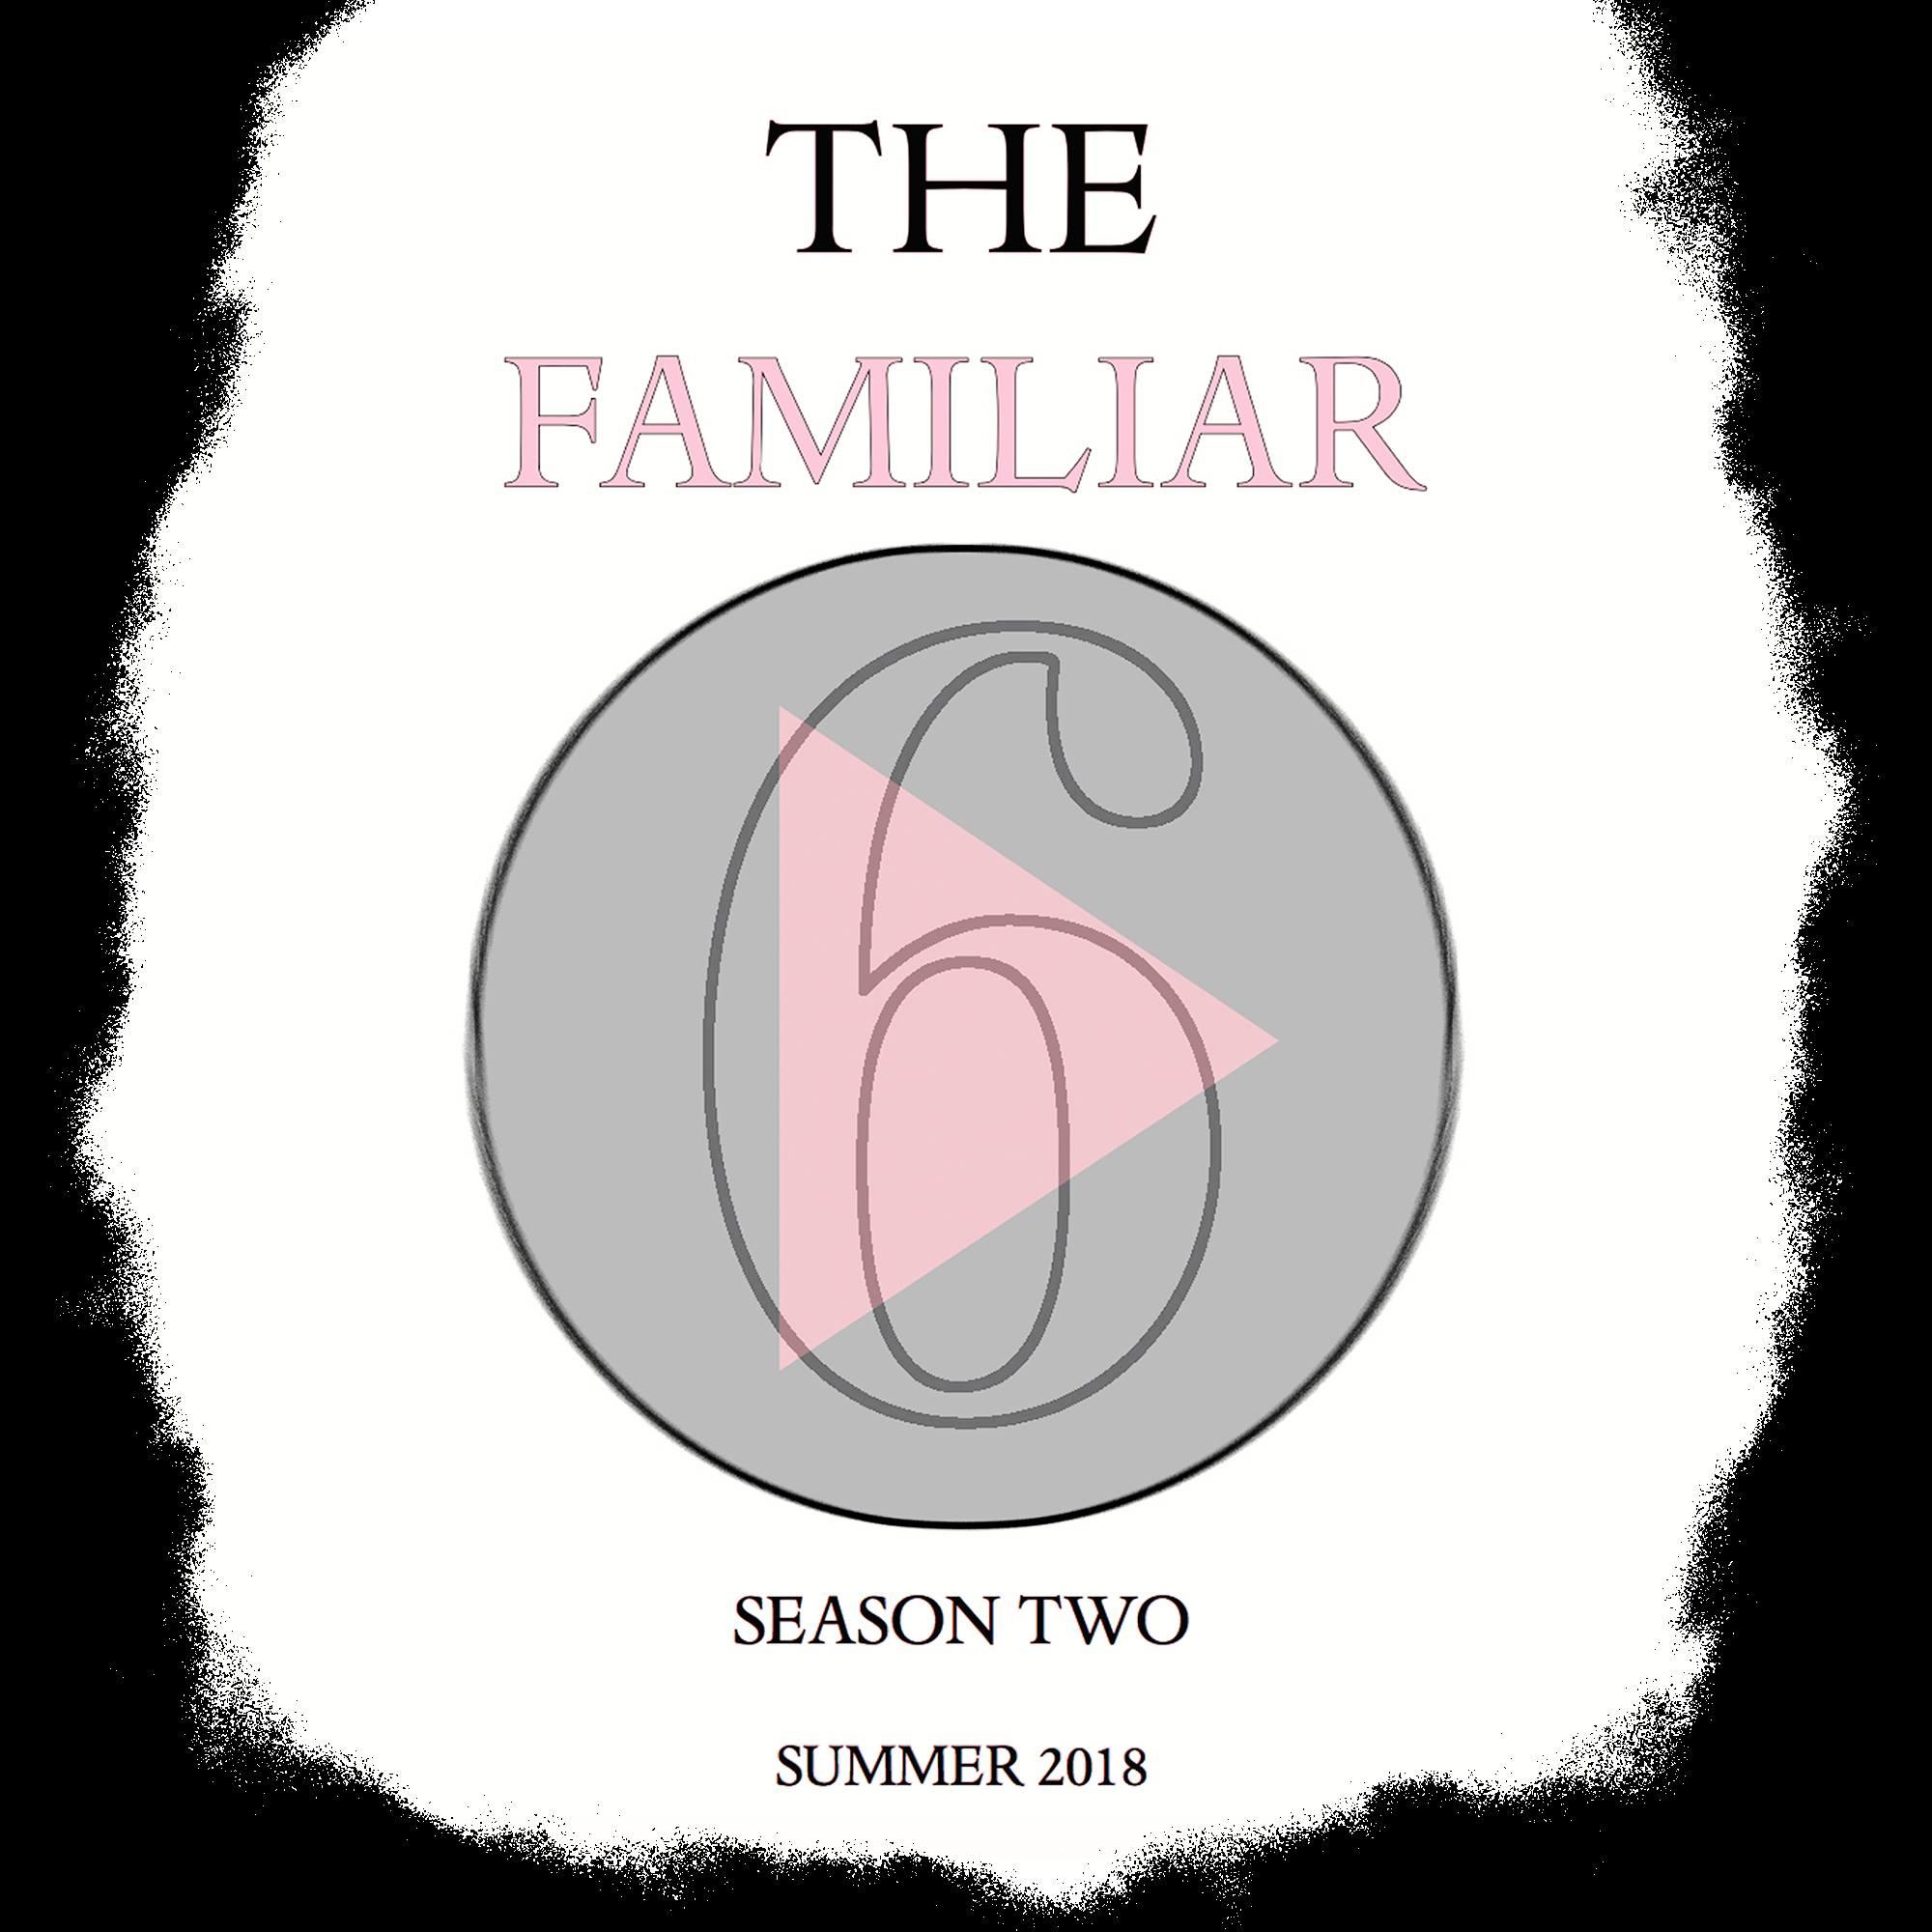 thefamiliar